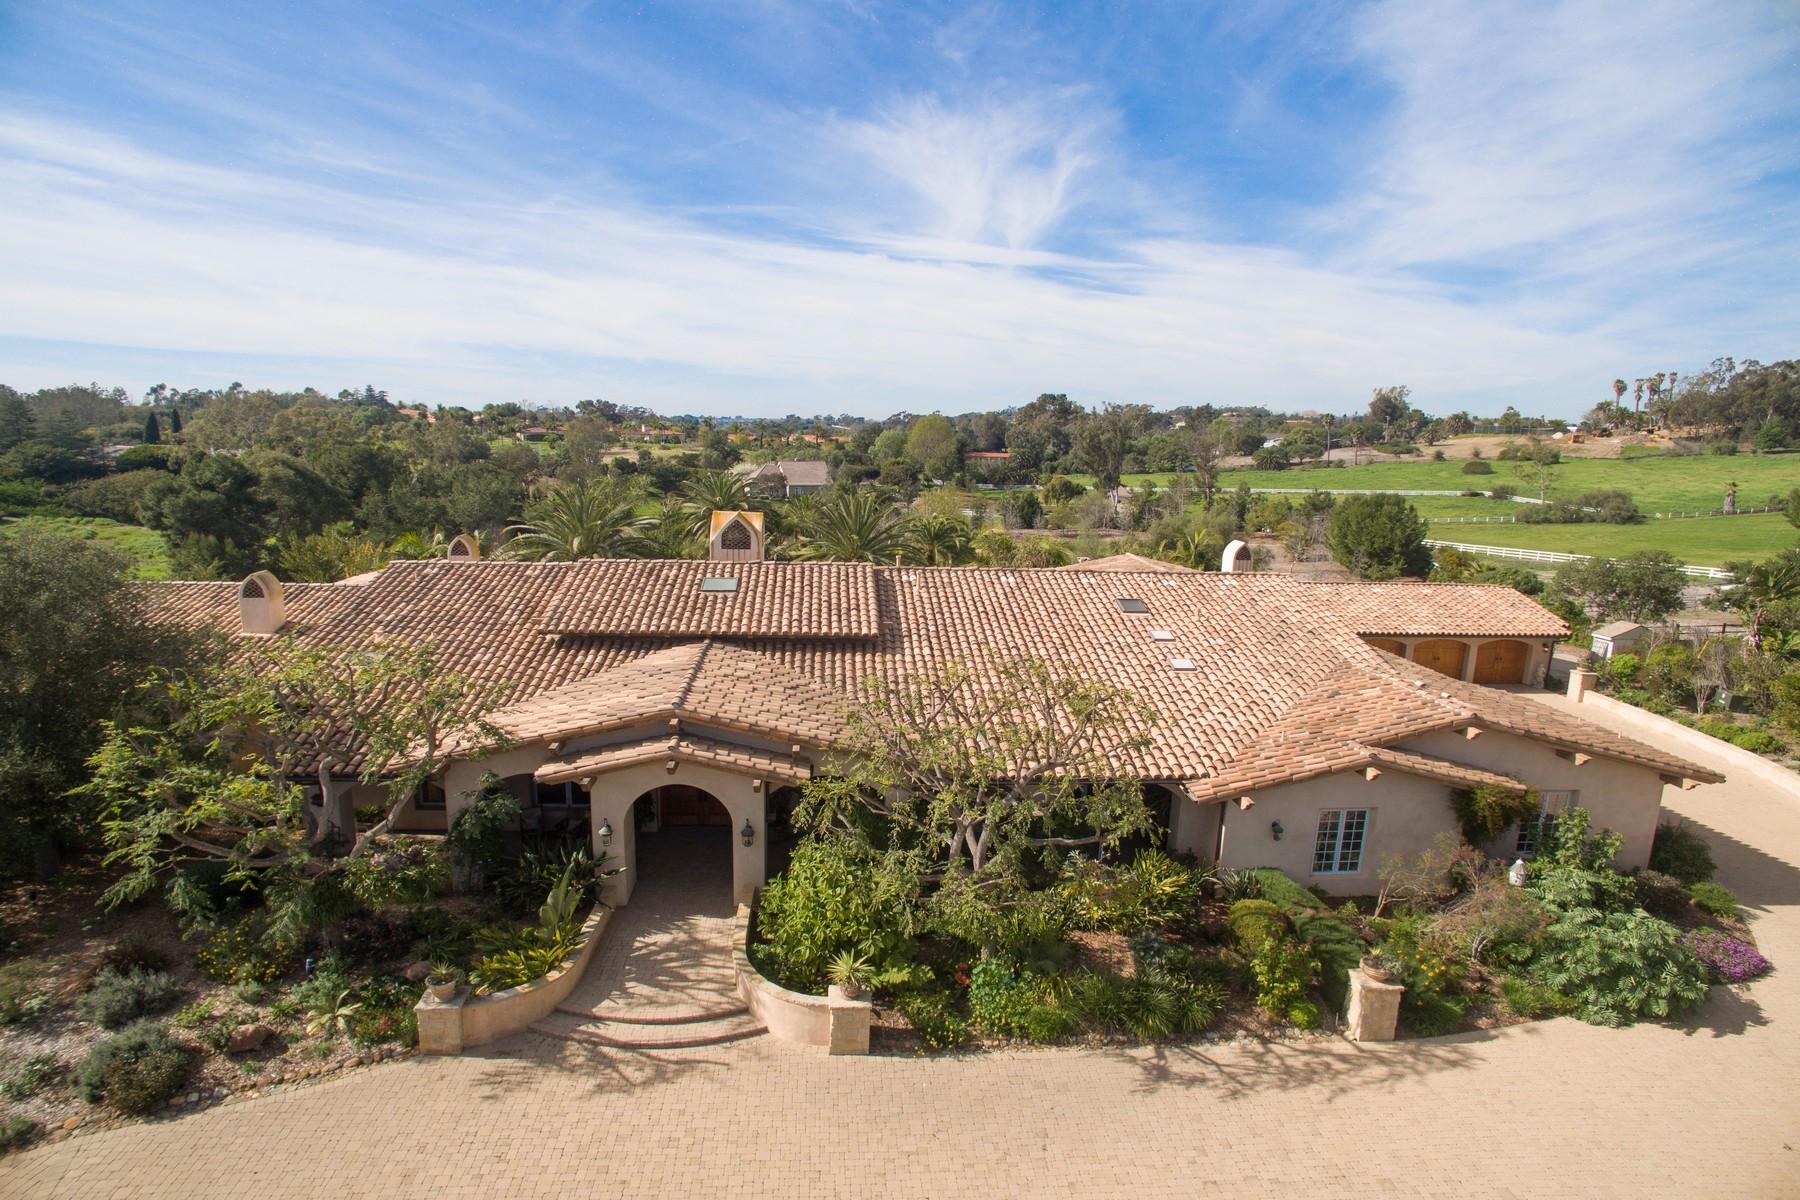 Single Family Home for Sale at 7099 El Camino del Norte Rancho Santa Fe, California, 92067 United States